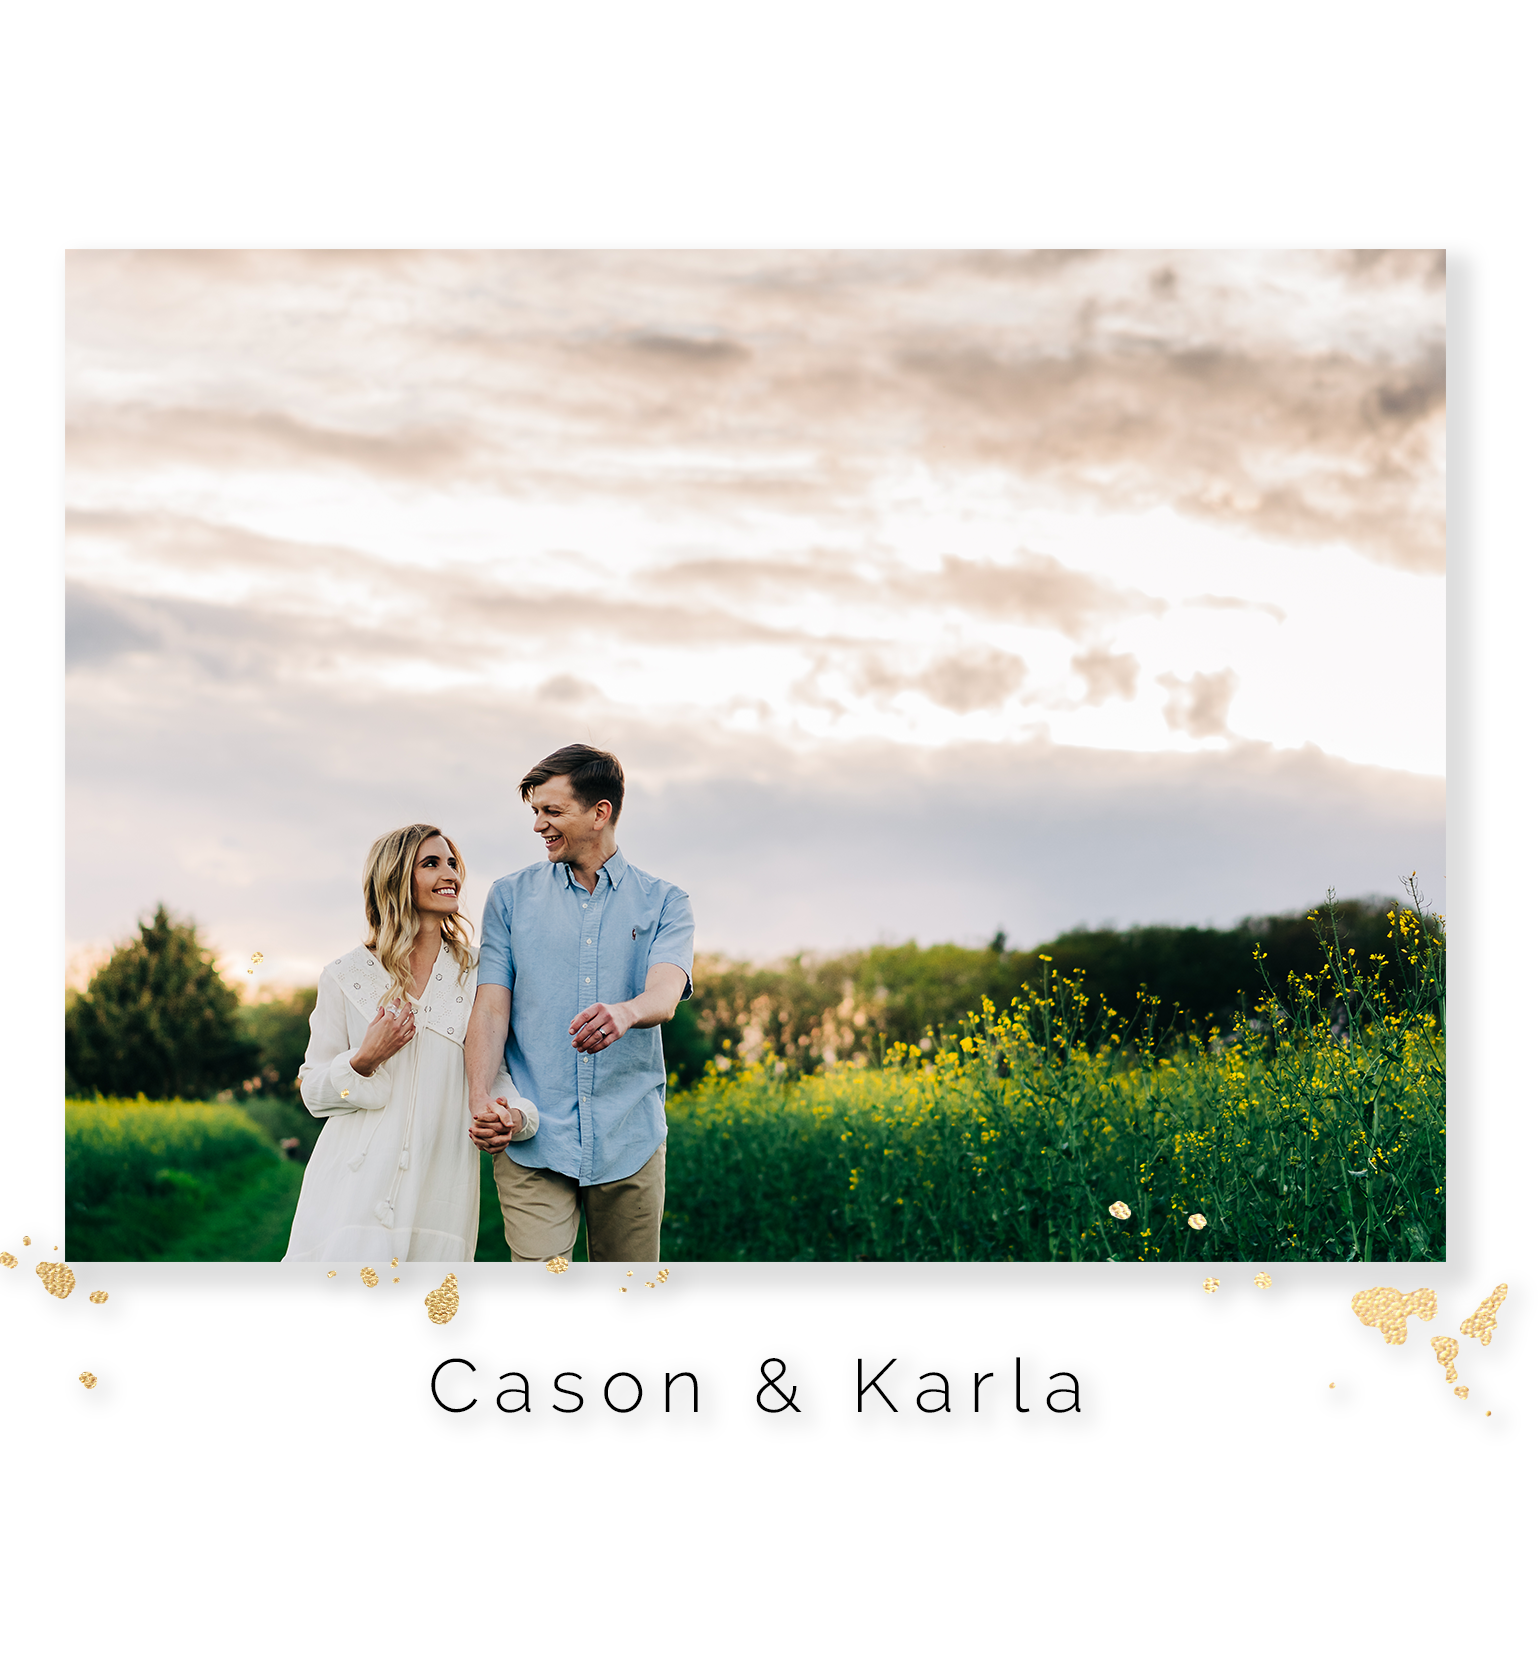 Cason and Karla